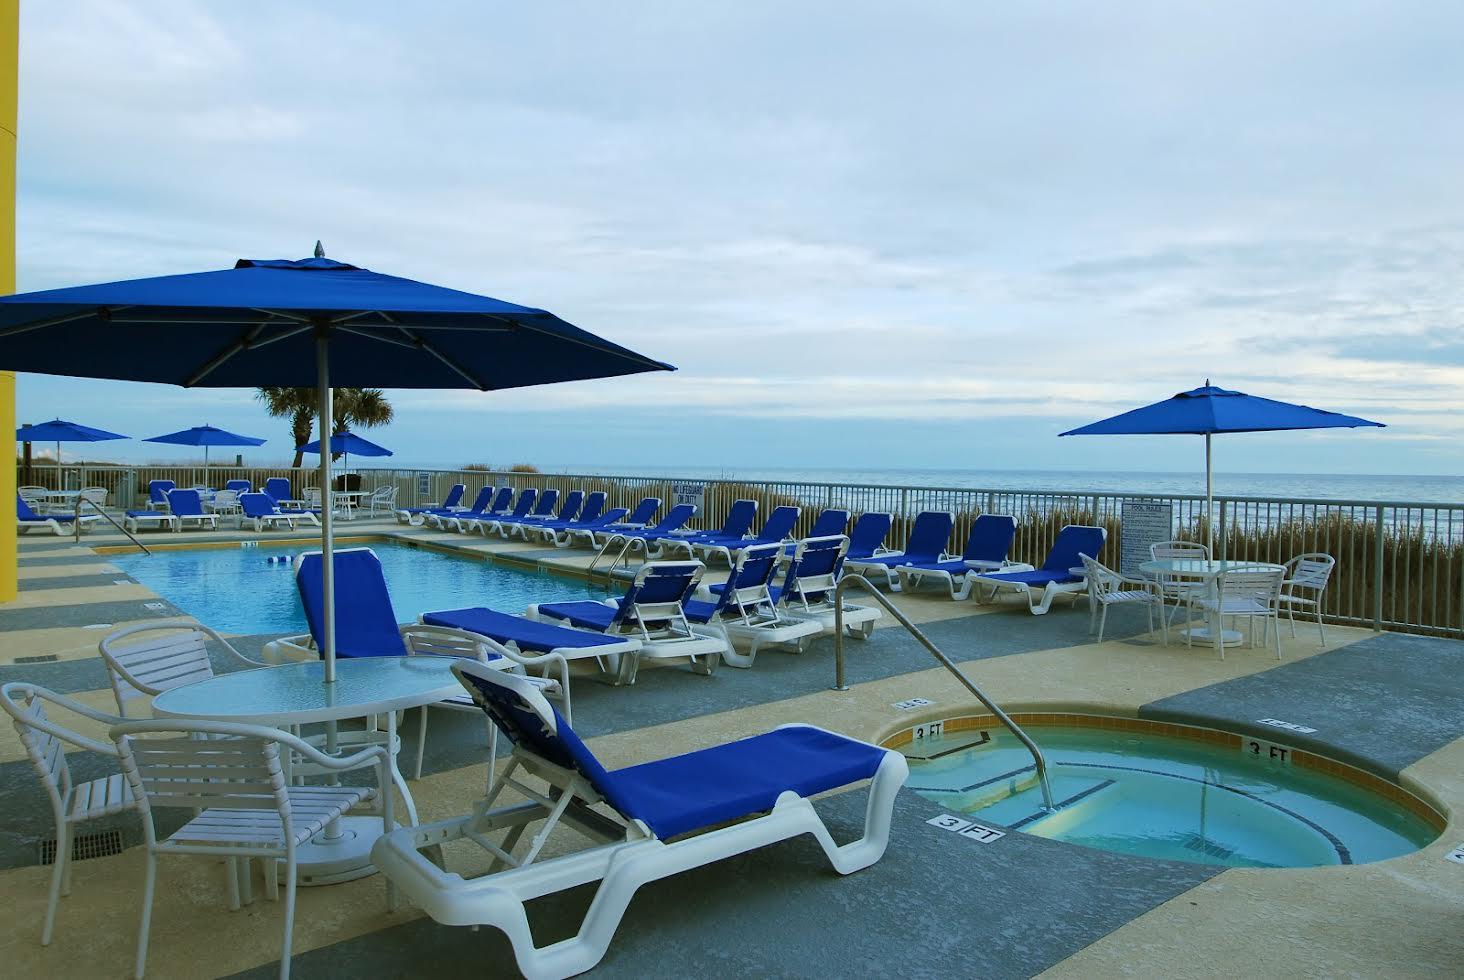 Seaside Resort Picture Number 6